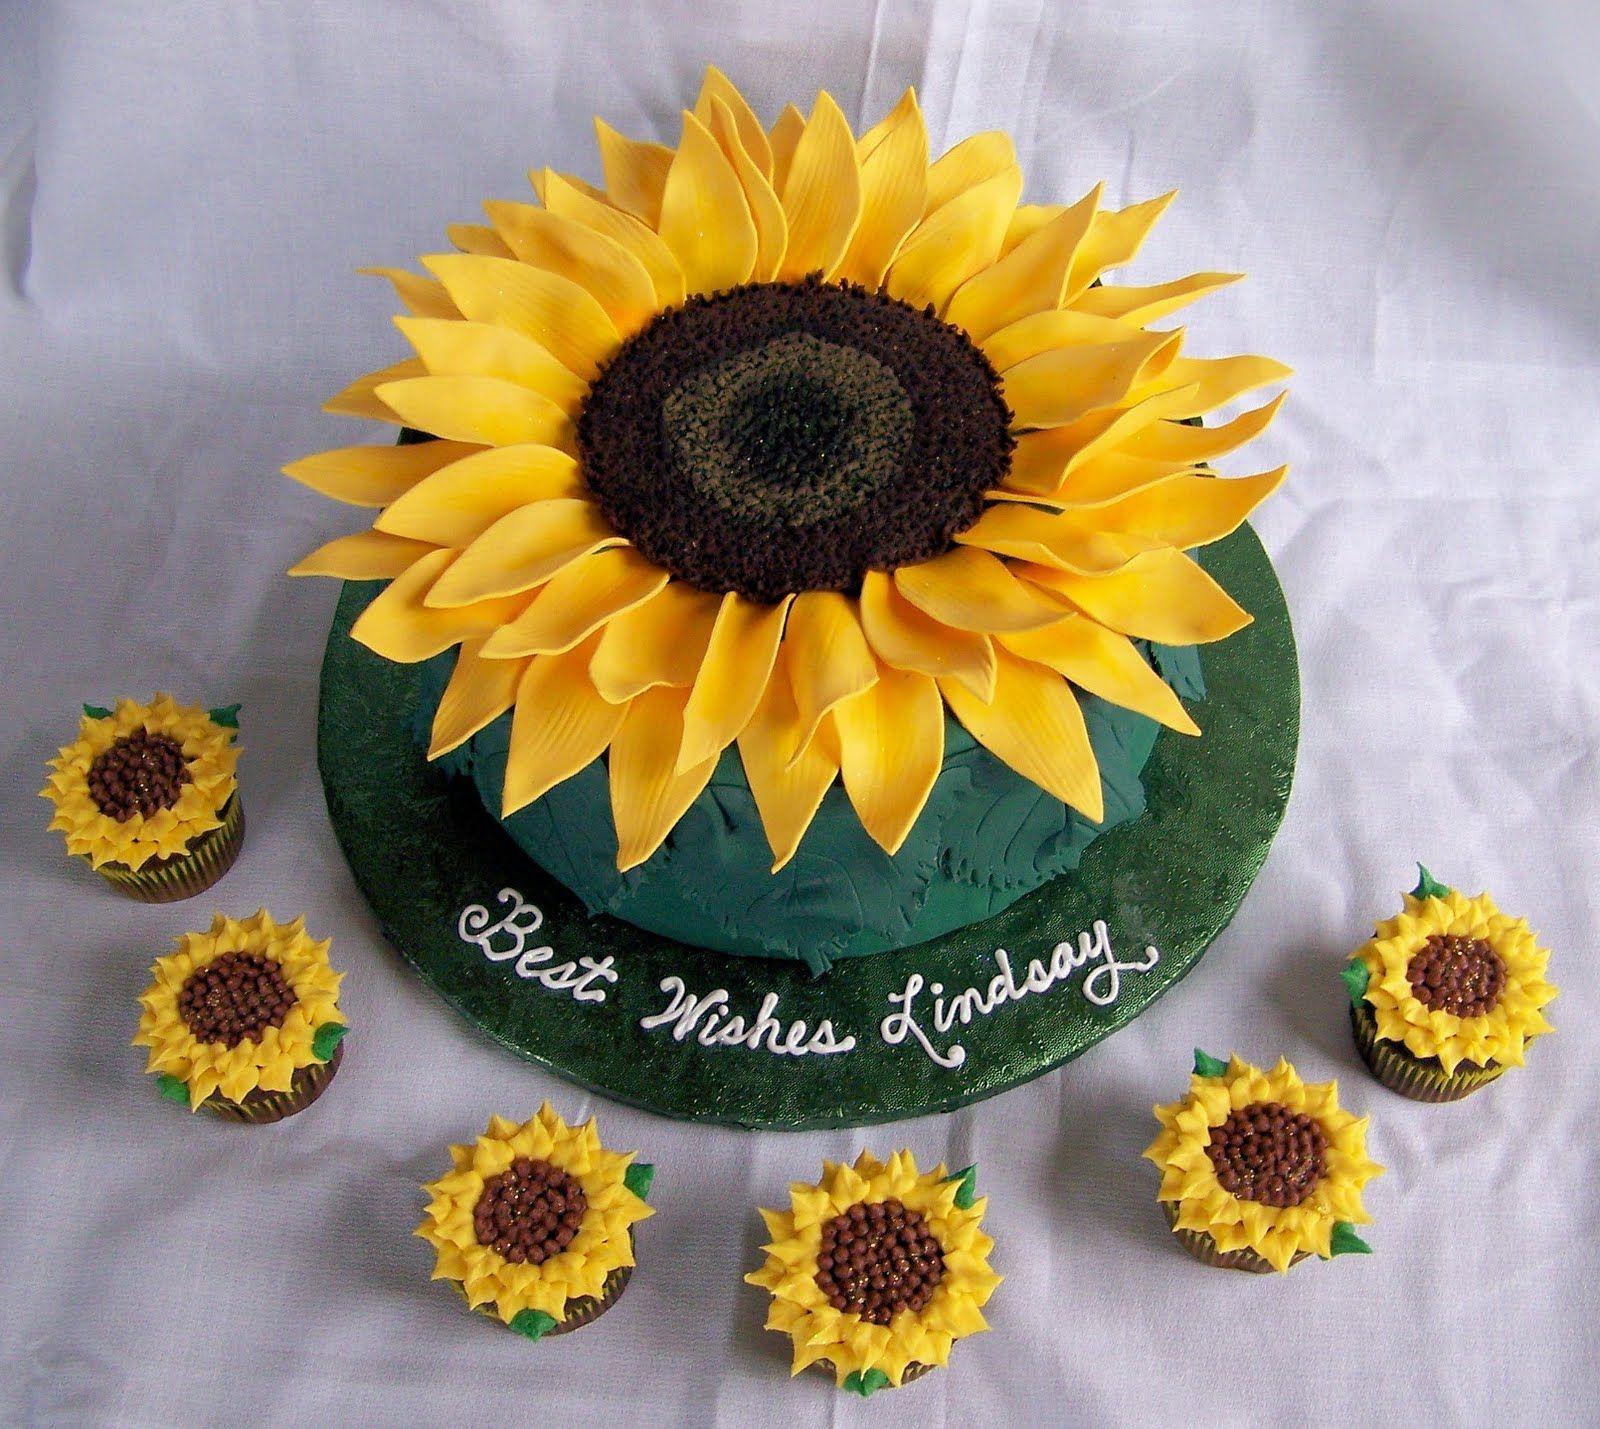 Sunflower Birthday Cake Design Ideas 87241 | Pinterest Sunfl